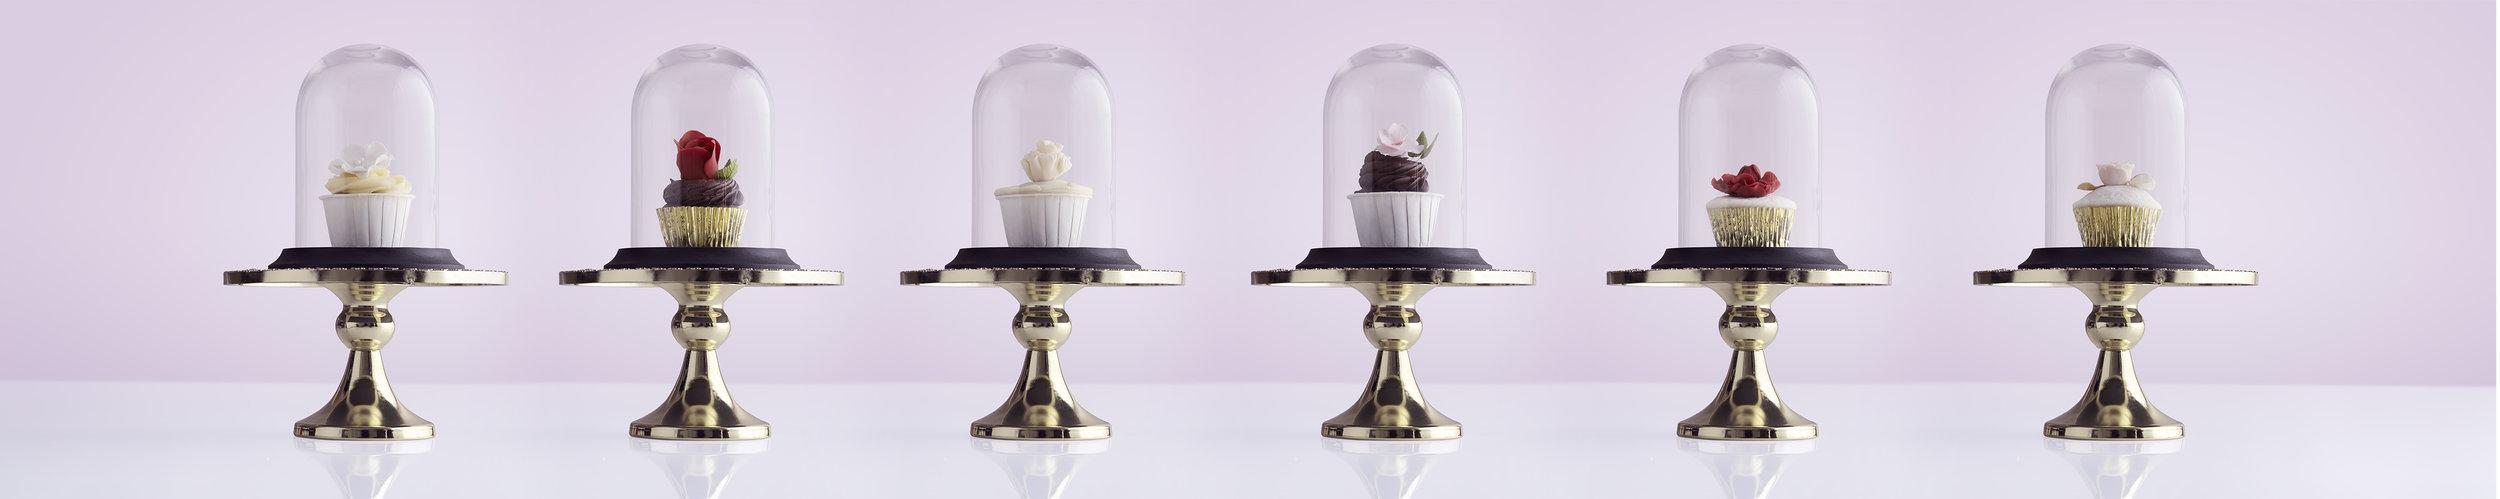 cakes-thepinkkitchen_weddingcupcakes_01a.jpg